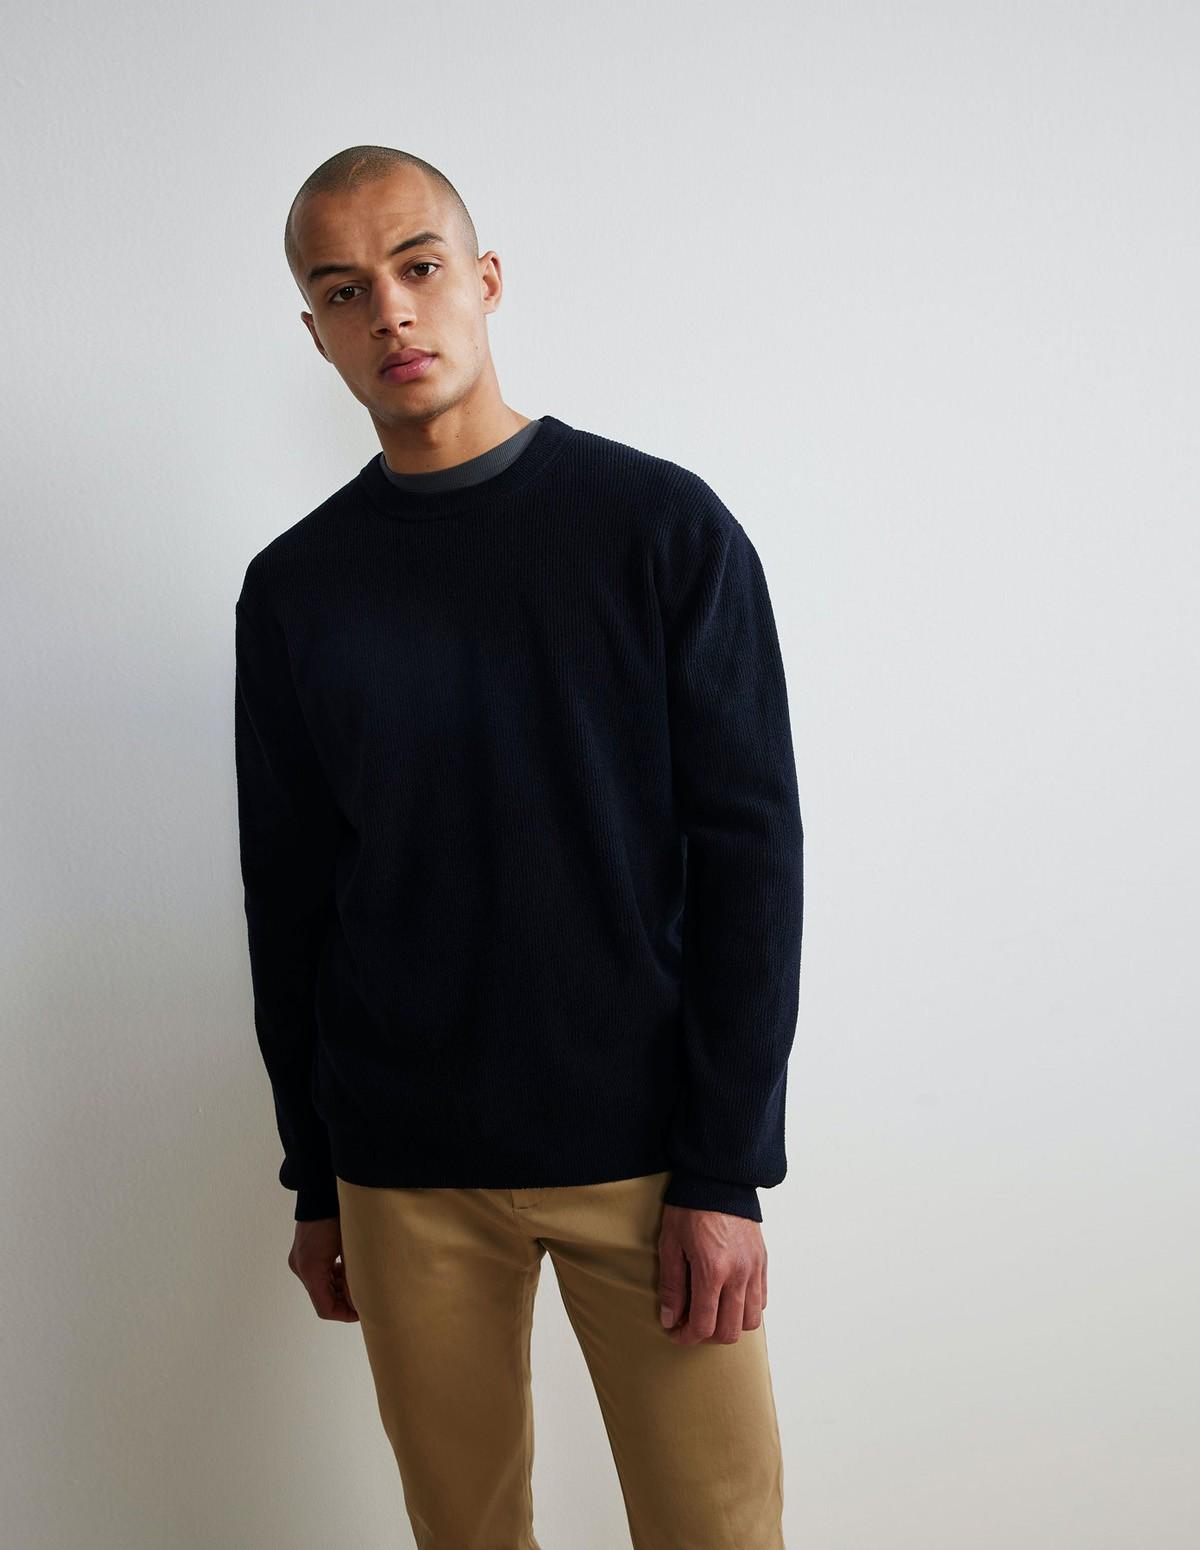 Nn07 Danny Sweater - 200 NAVY